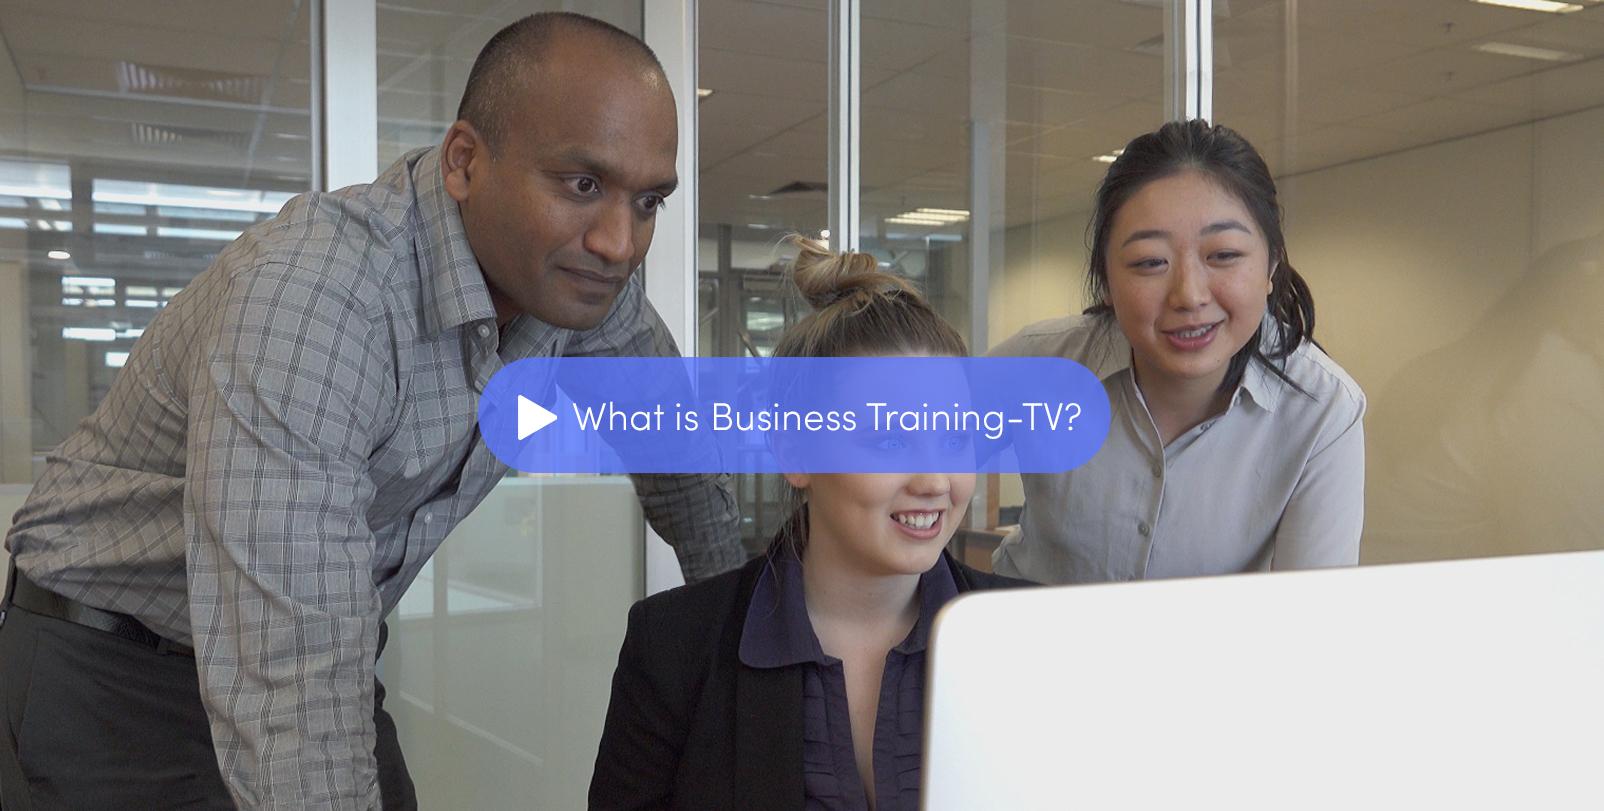 Business Training-TV